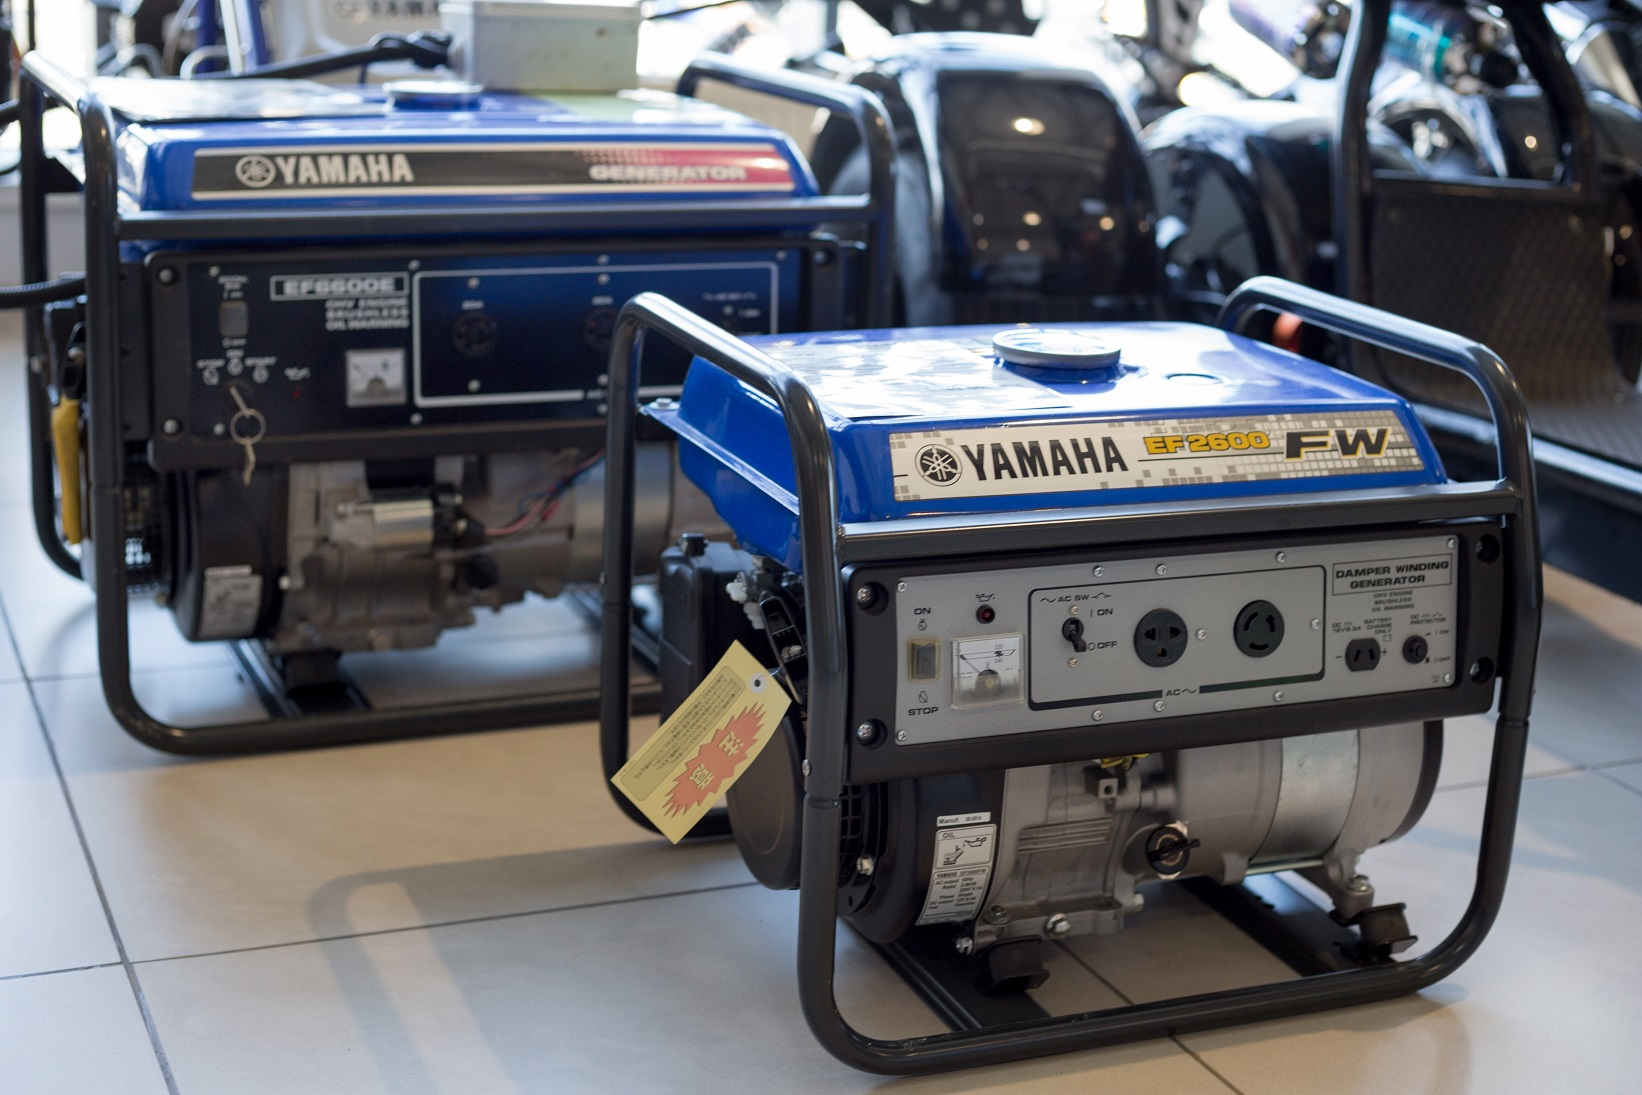 2 Blue yamaha Generators